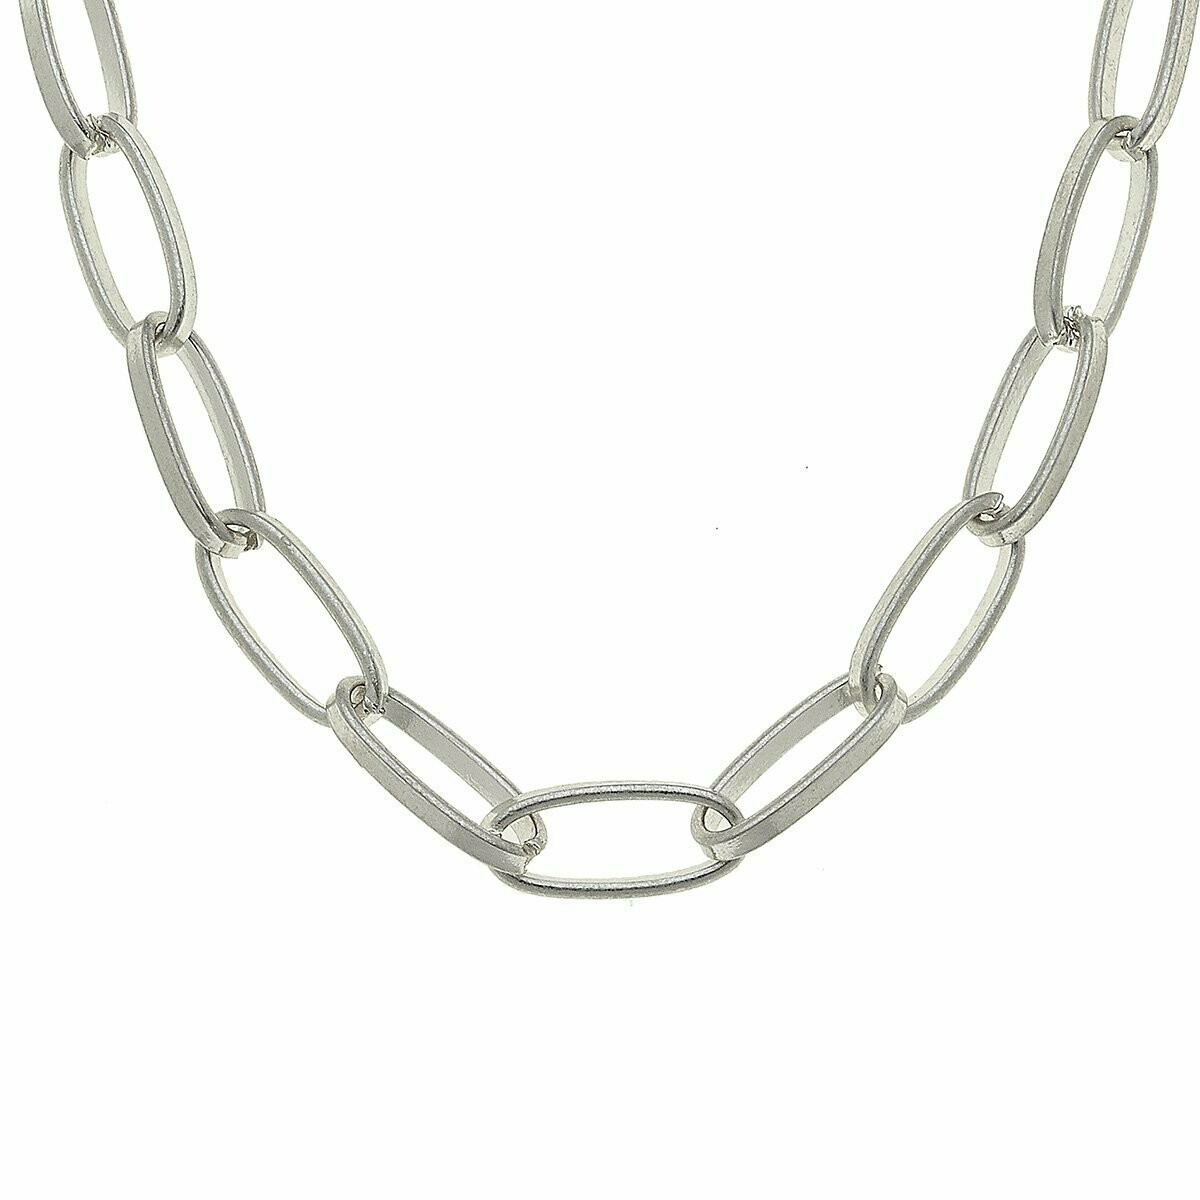 Jolie Chain Necklace In Worn Silver